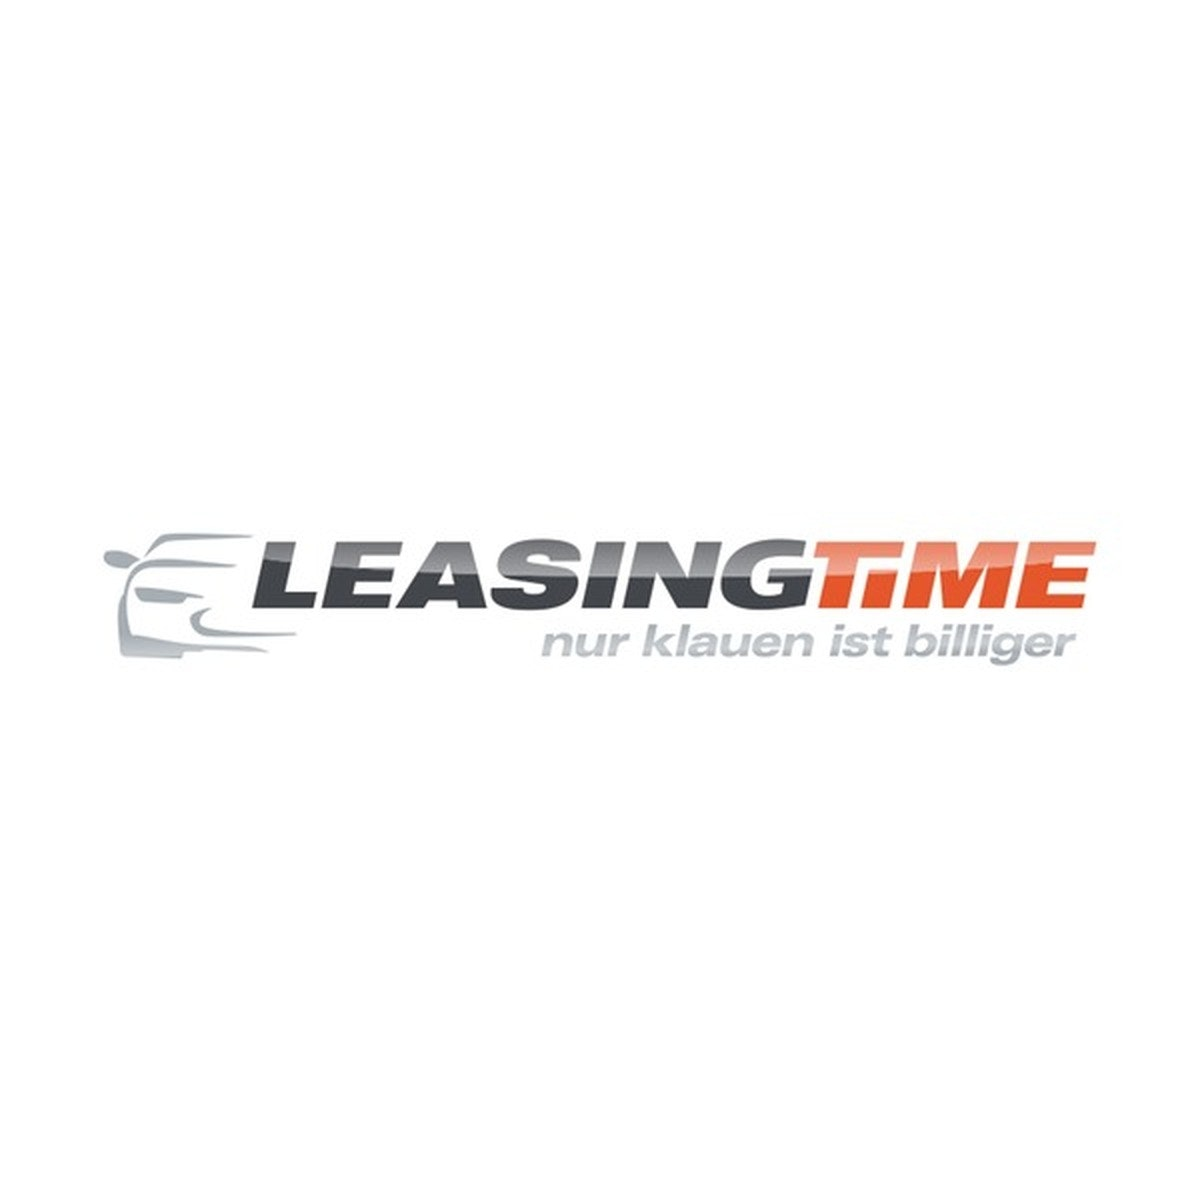 LeasingTime GmbH